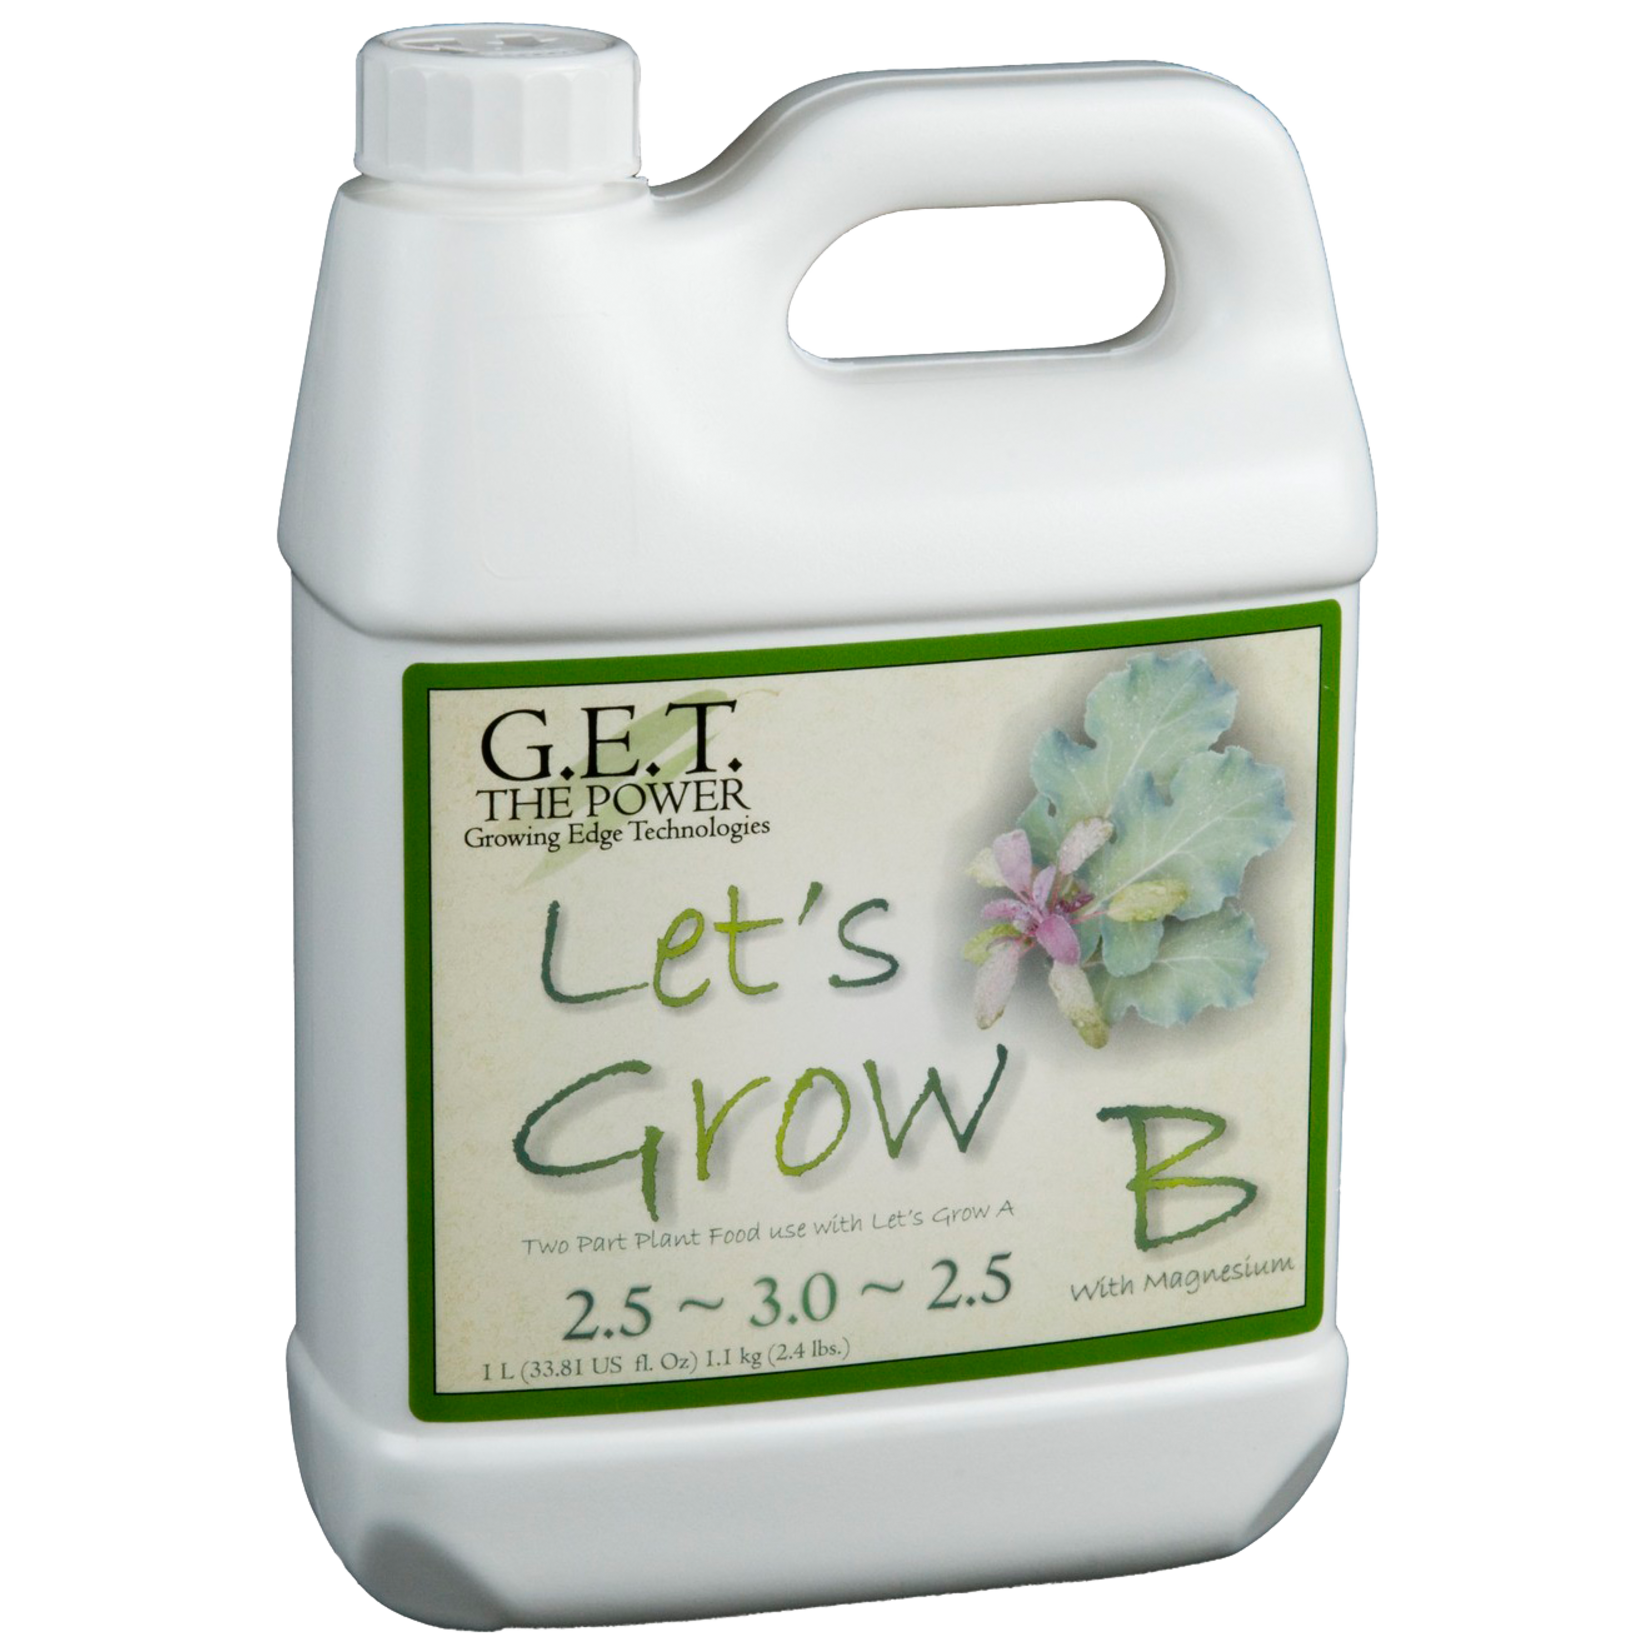 G.E.T. Nutrients Lets Grow B